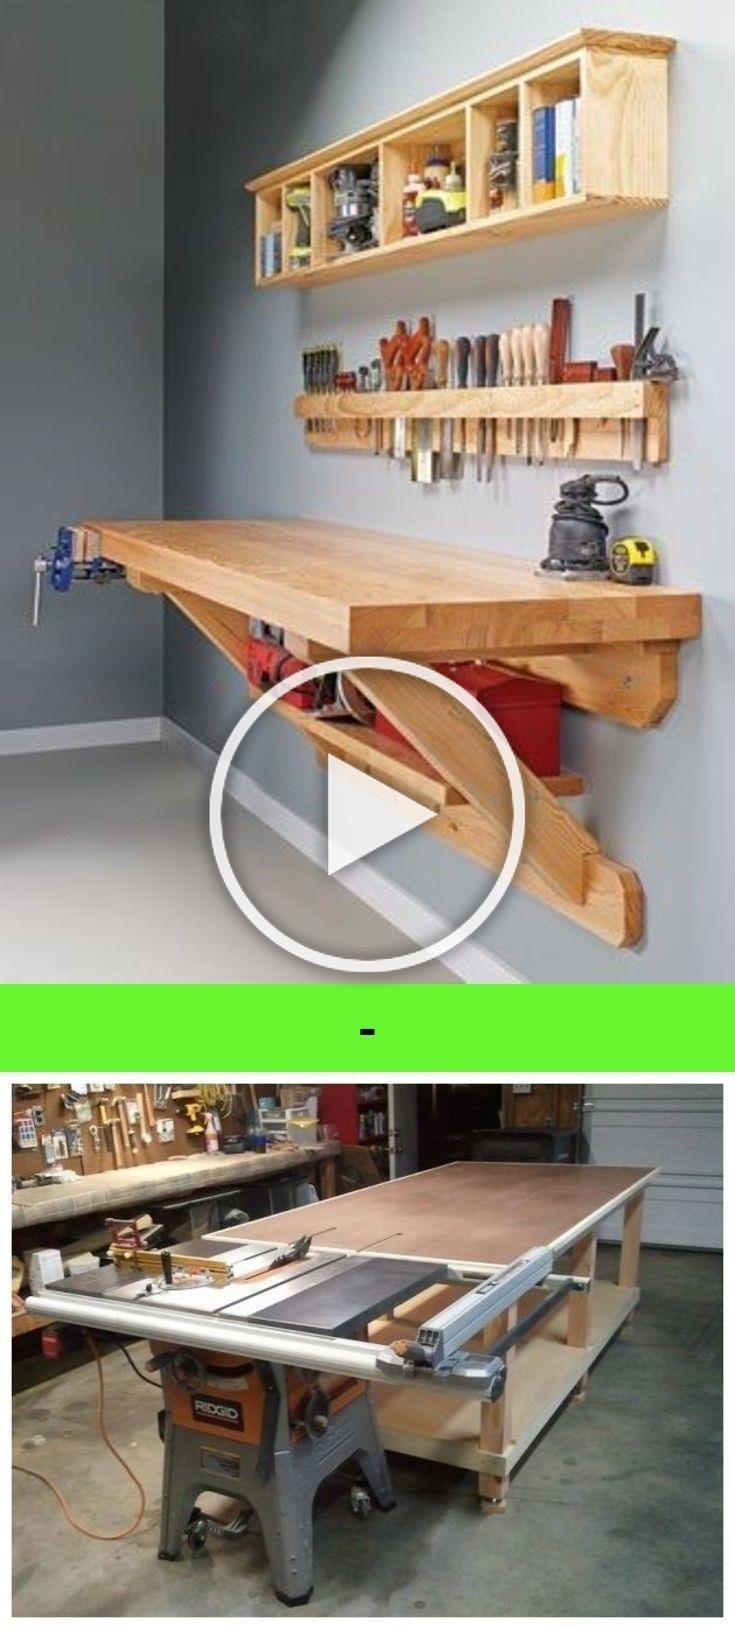 Diy bench press metal work bench shopbench bench